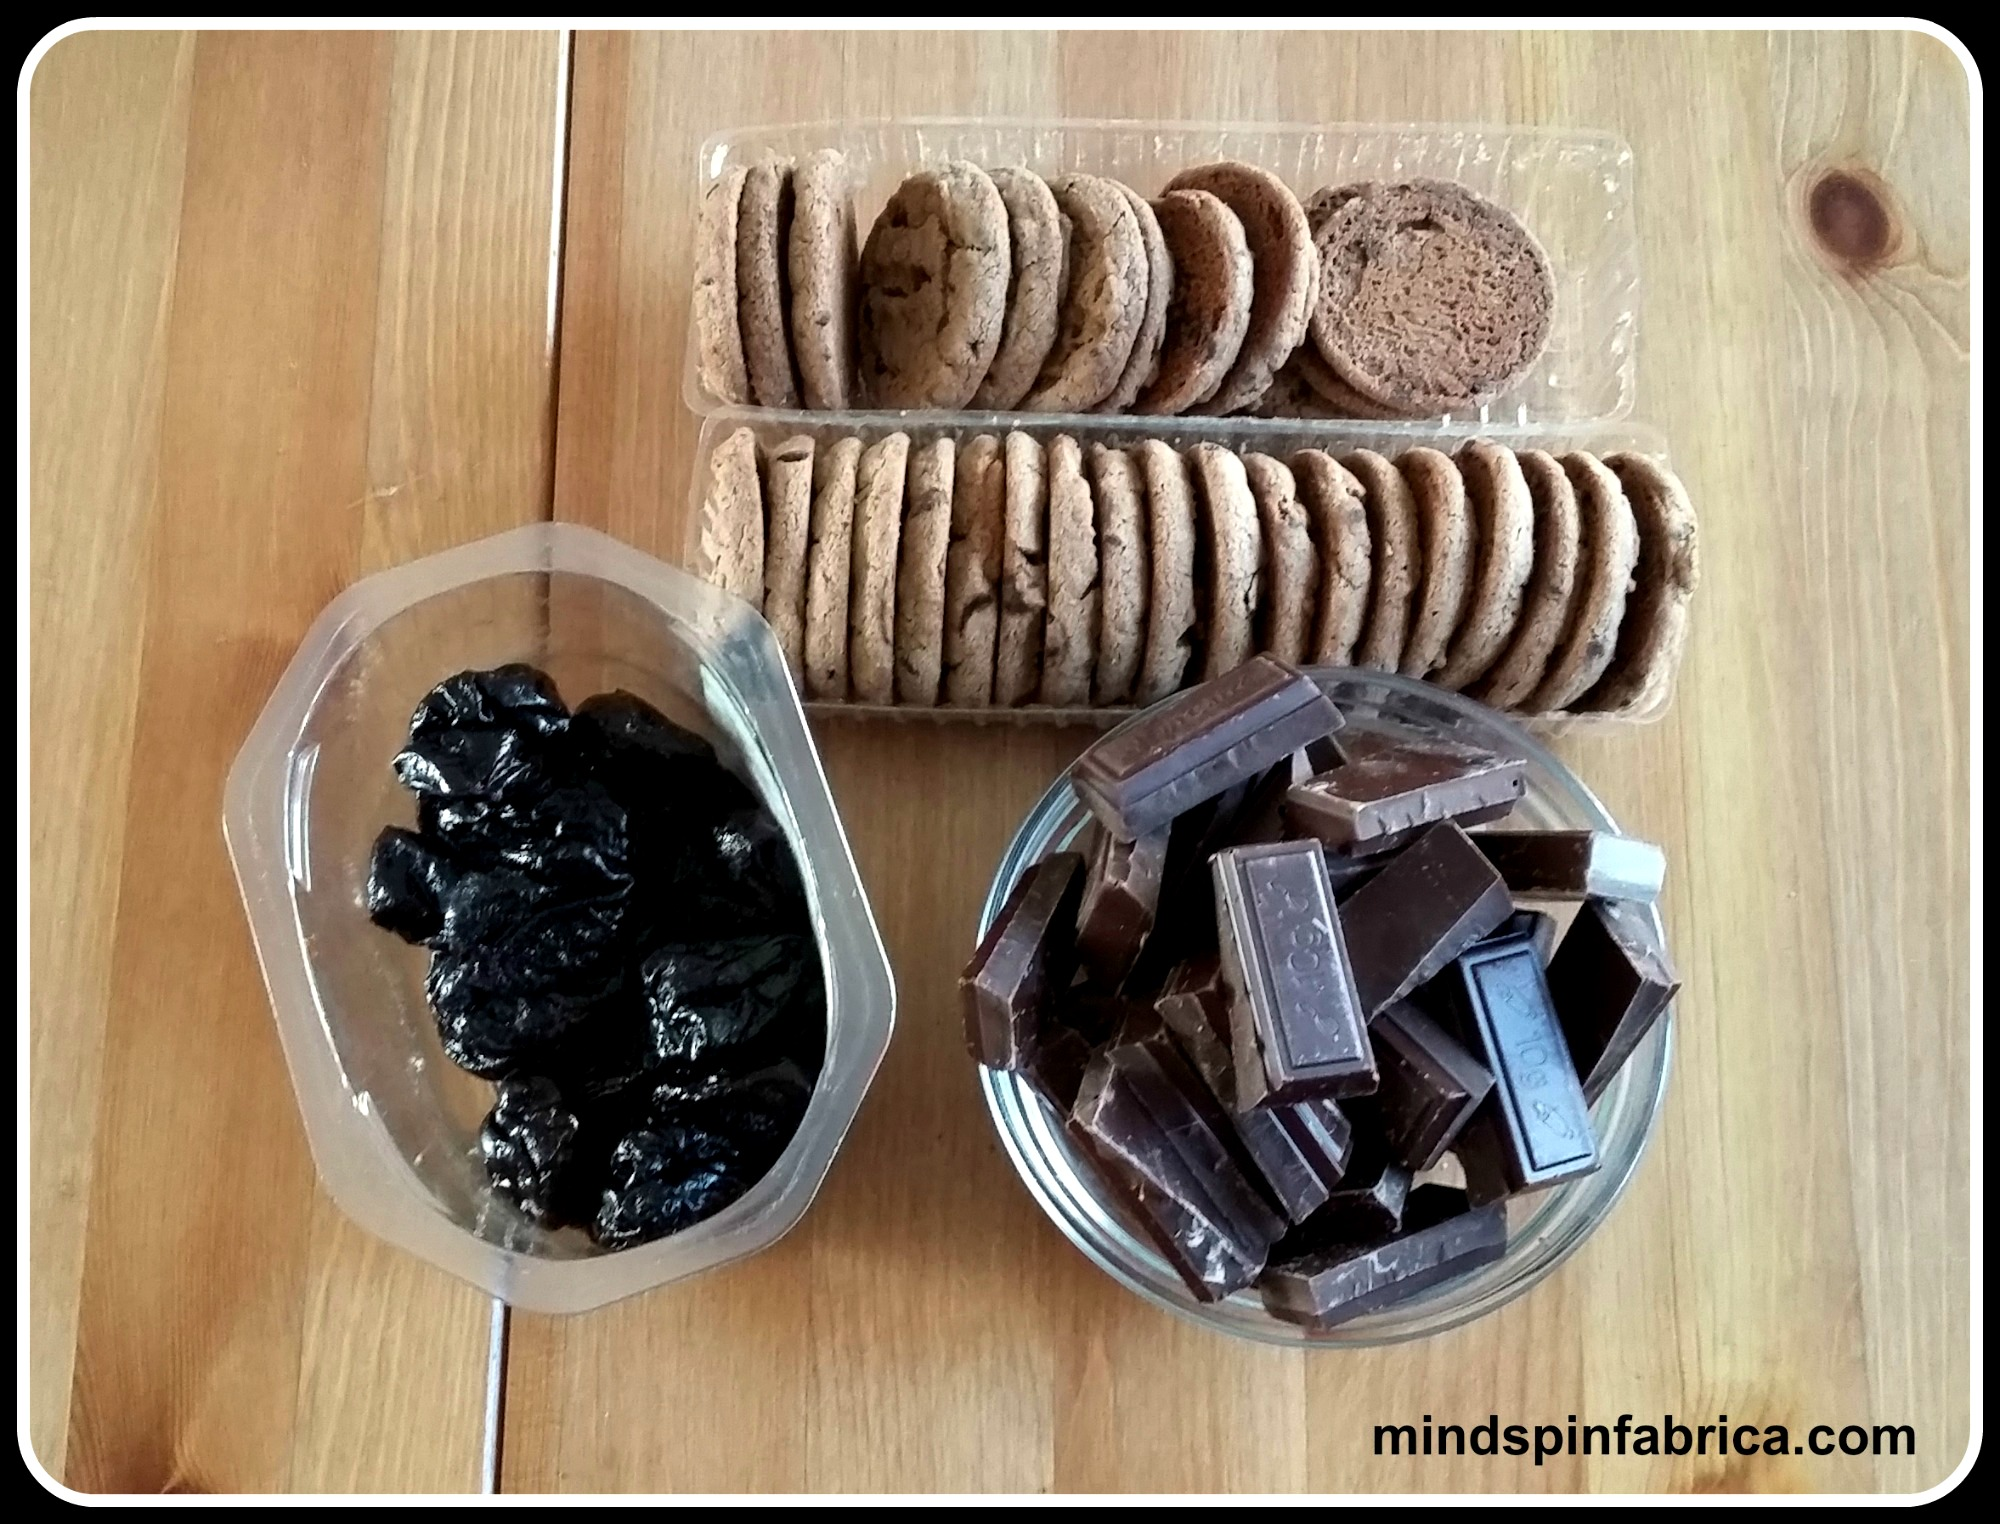 mindspinfabrica.com Τάρτα σοκολάτας με δαμάσκηνα